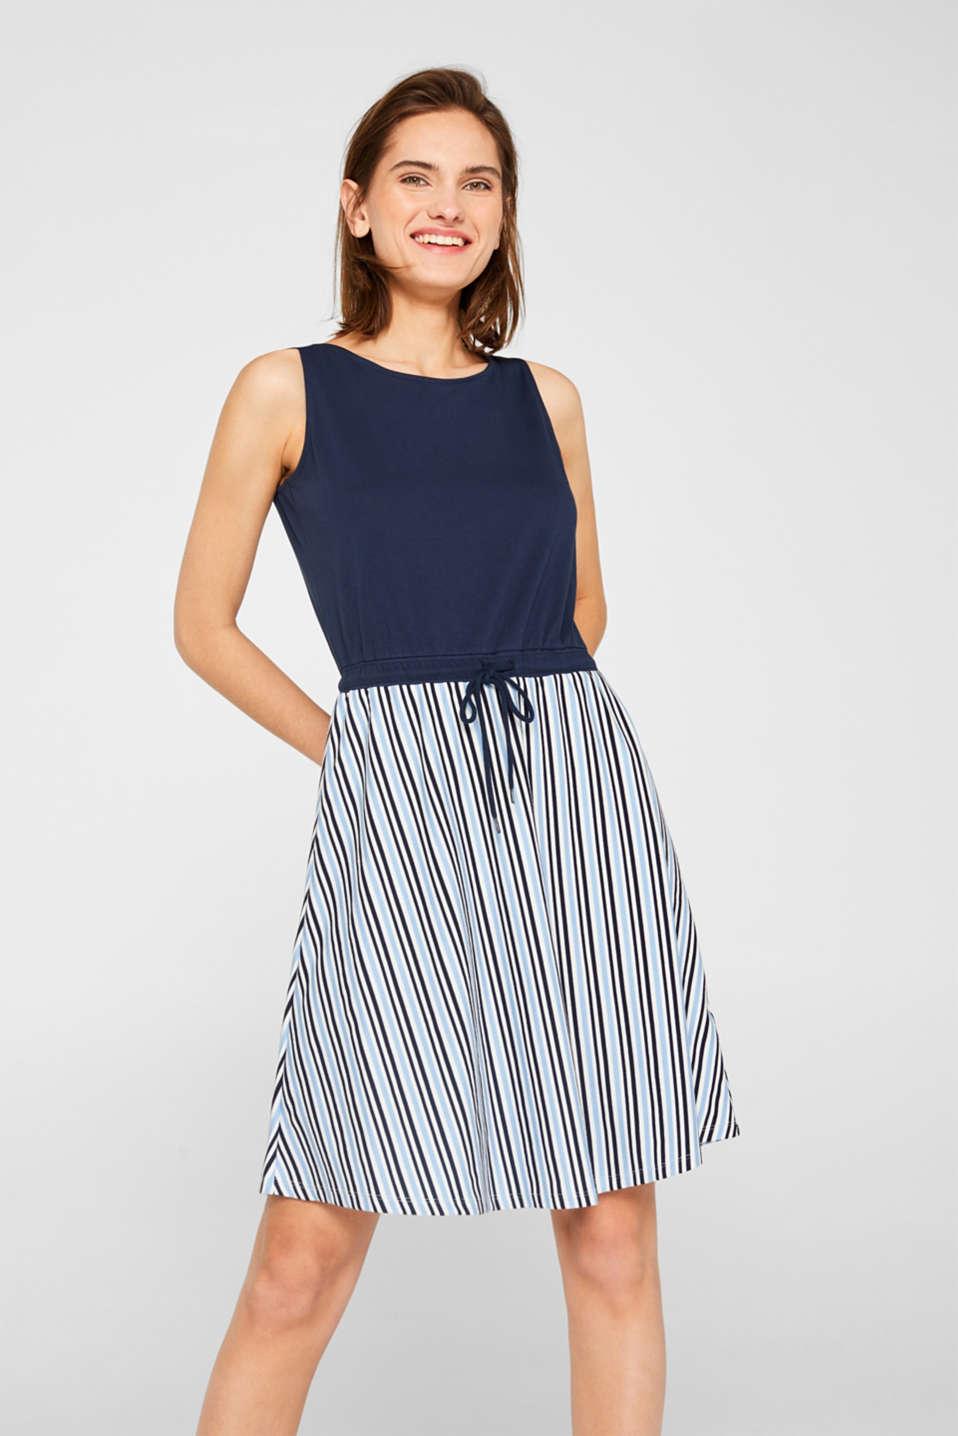 baaa1bf7bd85d6 edc - Jersey jurk met tunnelkoord en gestreepte rok kopen in de ...